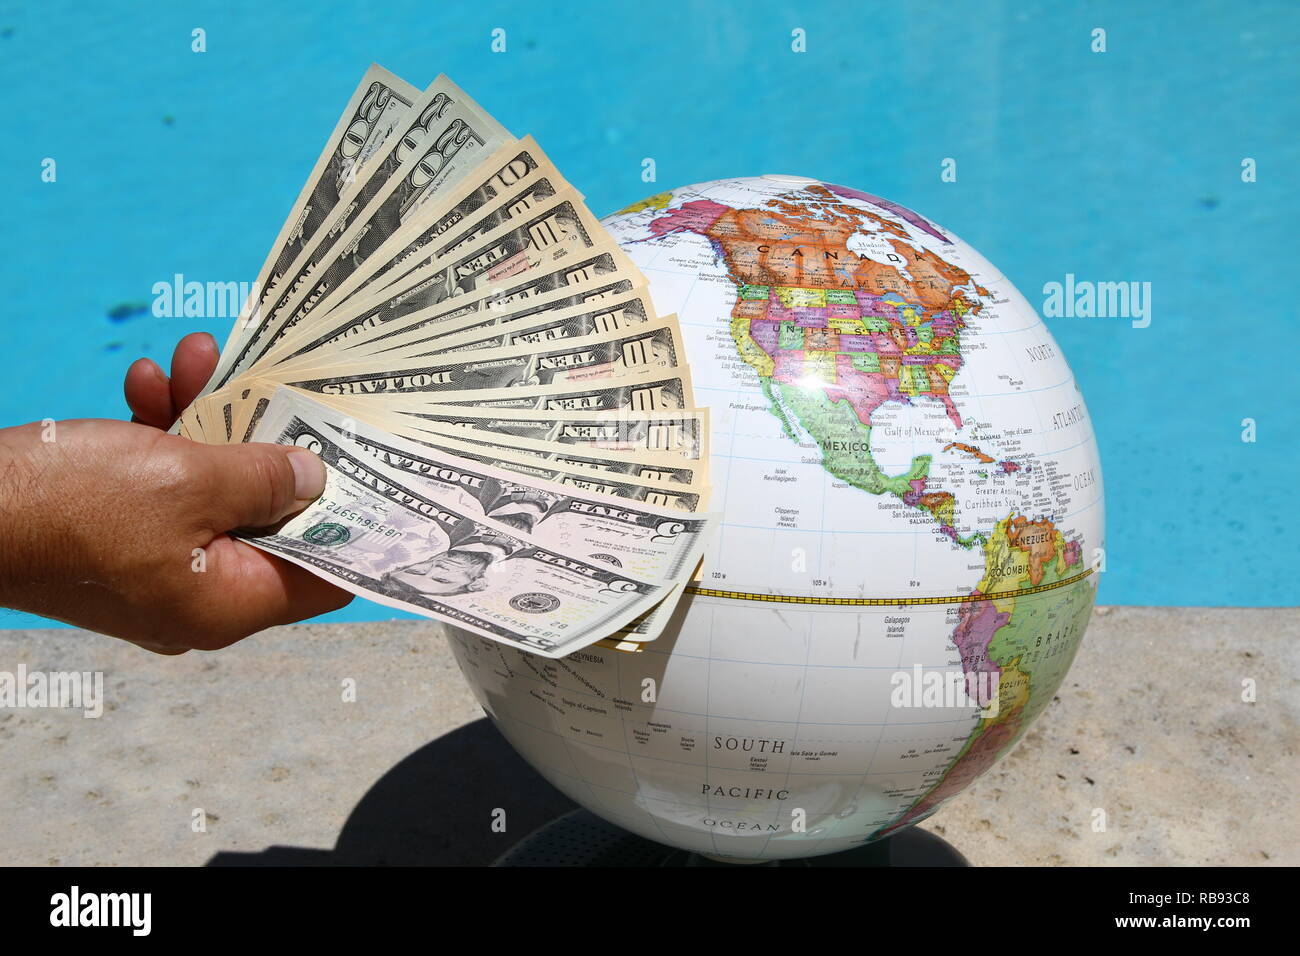 Global markets. The Dollar. United States Dollars. Man holding Dollars. Globe. World. White World. Money. Currency. Currencies. Cash. Dosh. Wonga. Money makes the world go around. - Stock Image